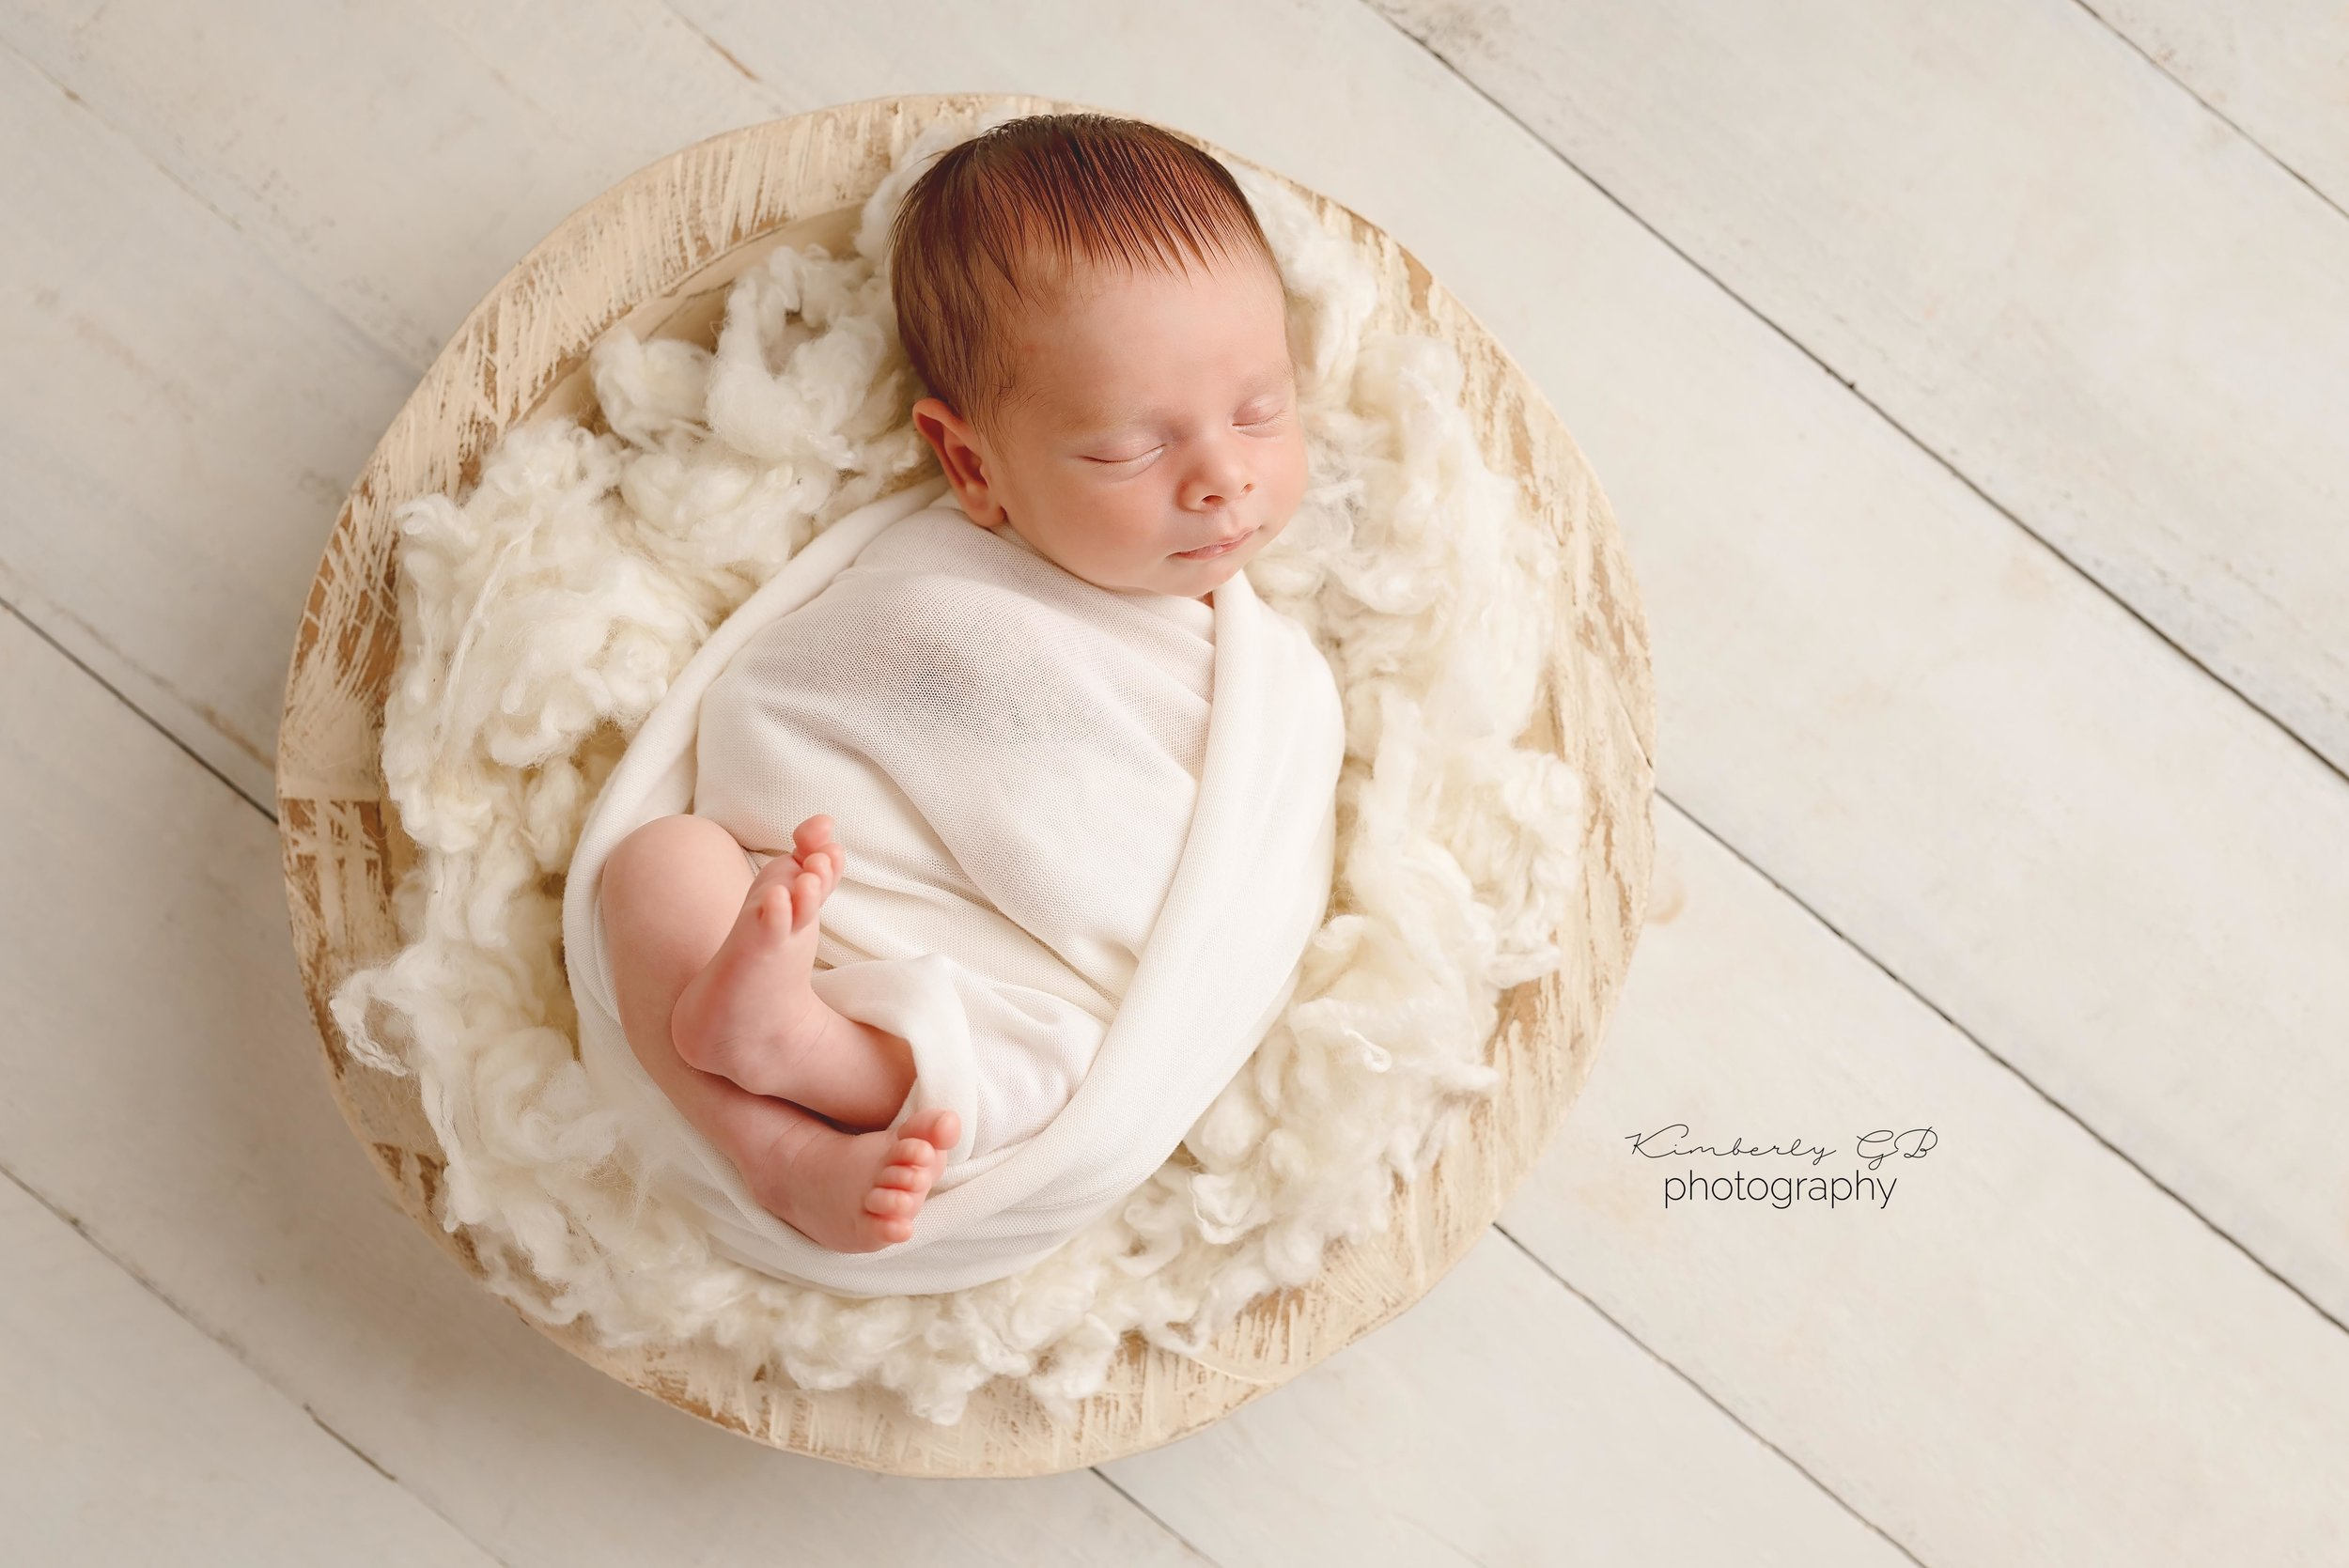 fotografia-de-recien-nacidos-bebes-newborn-en-puerto-rico-kimberly-gb-photography-fotografa-248.jpg